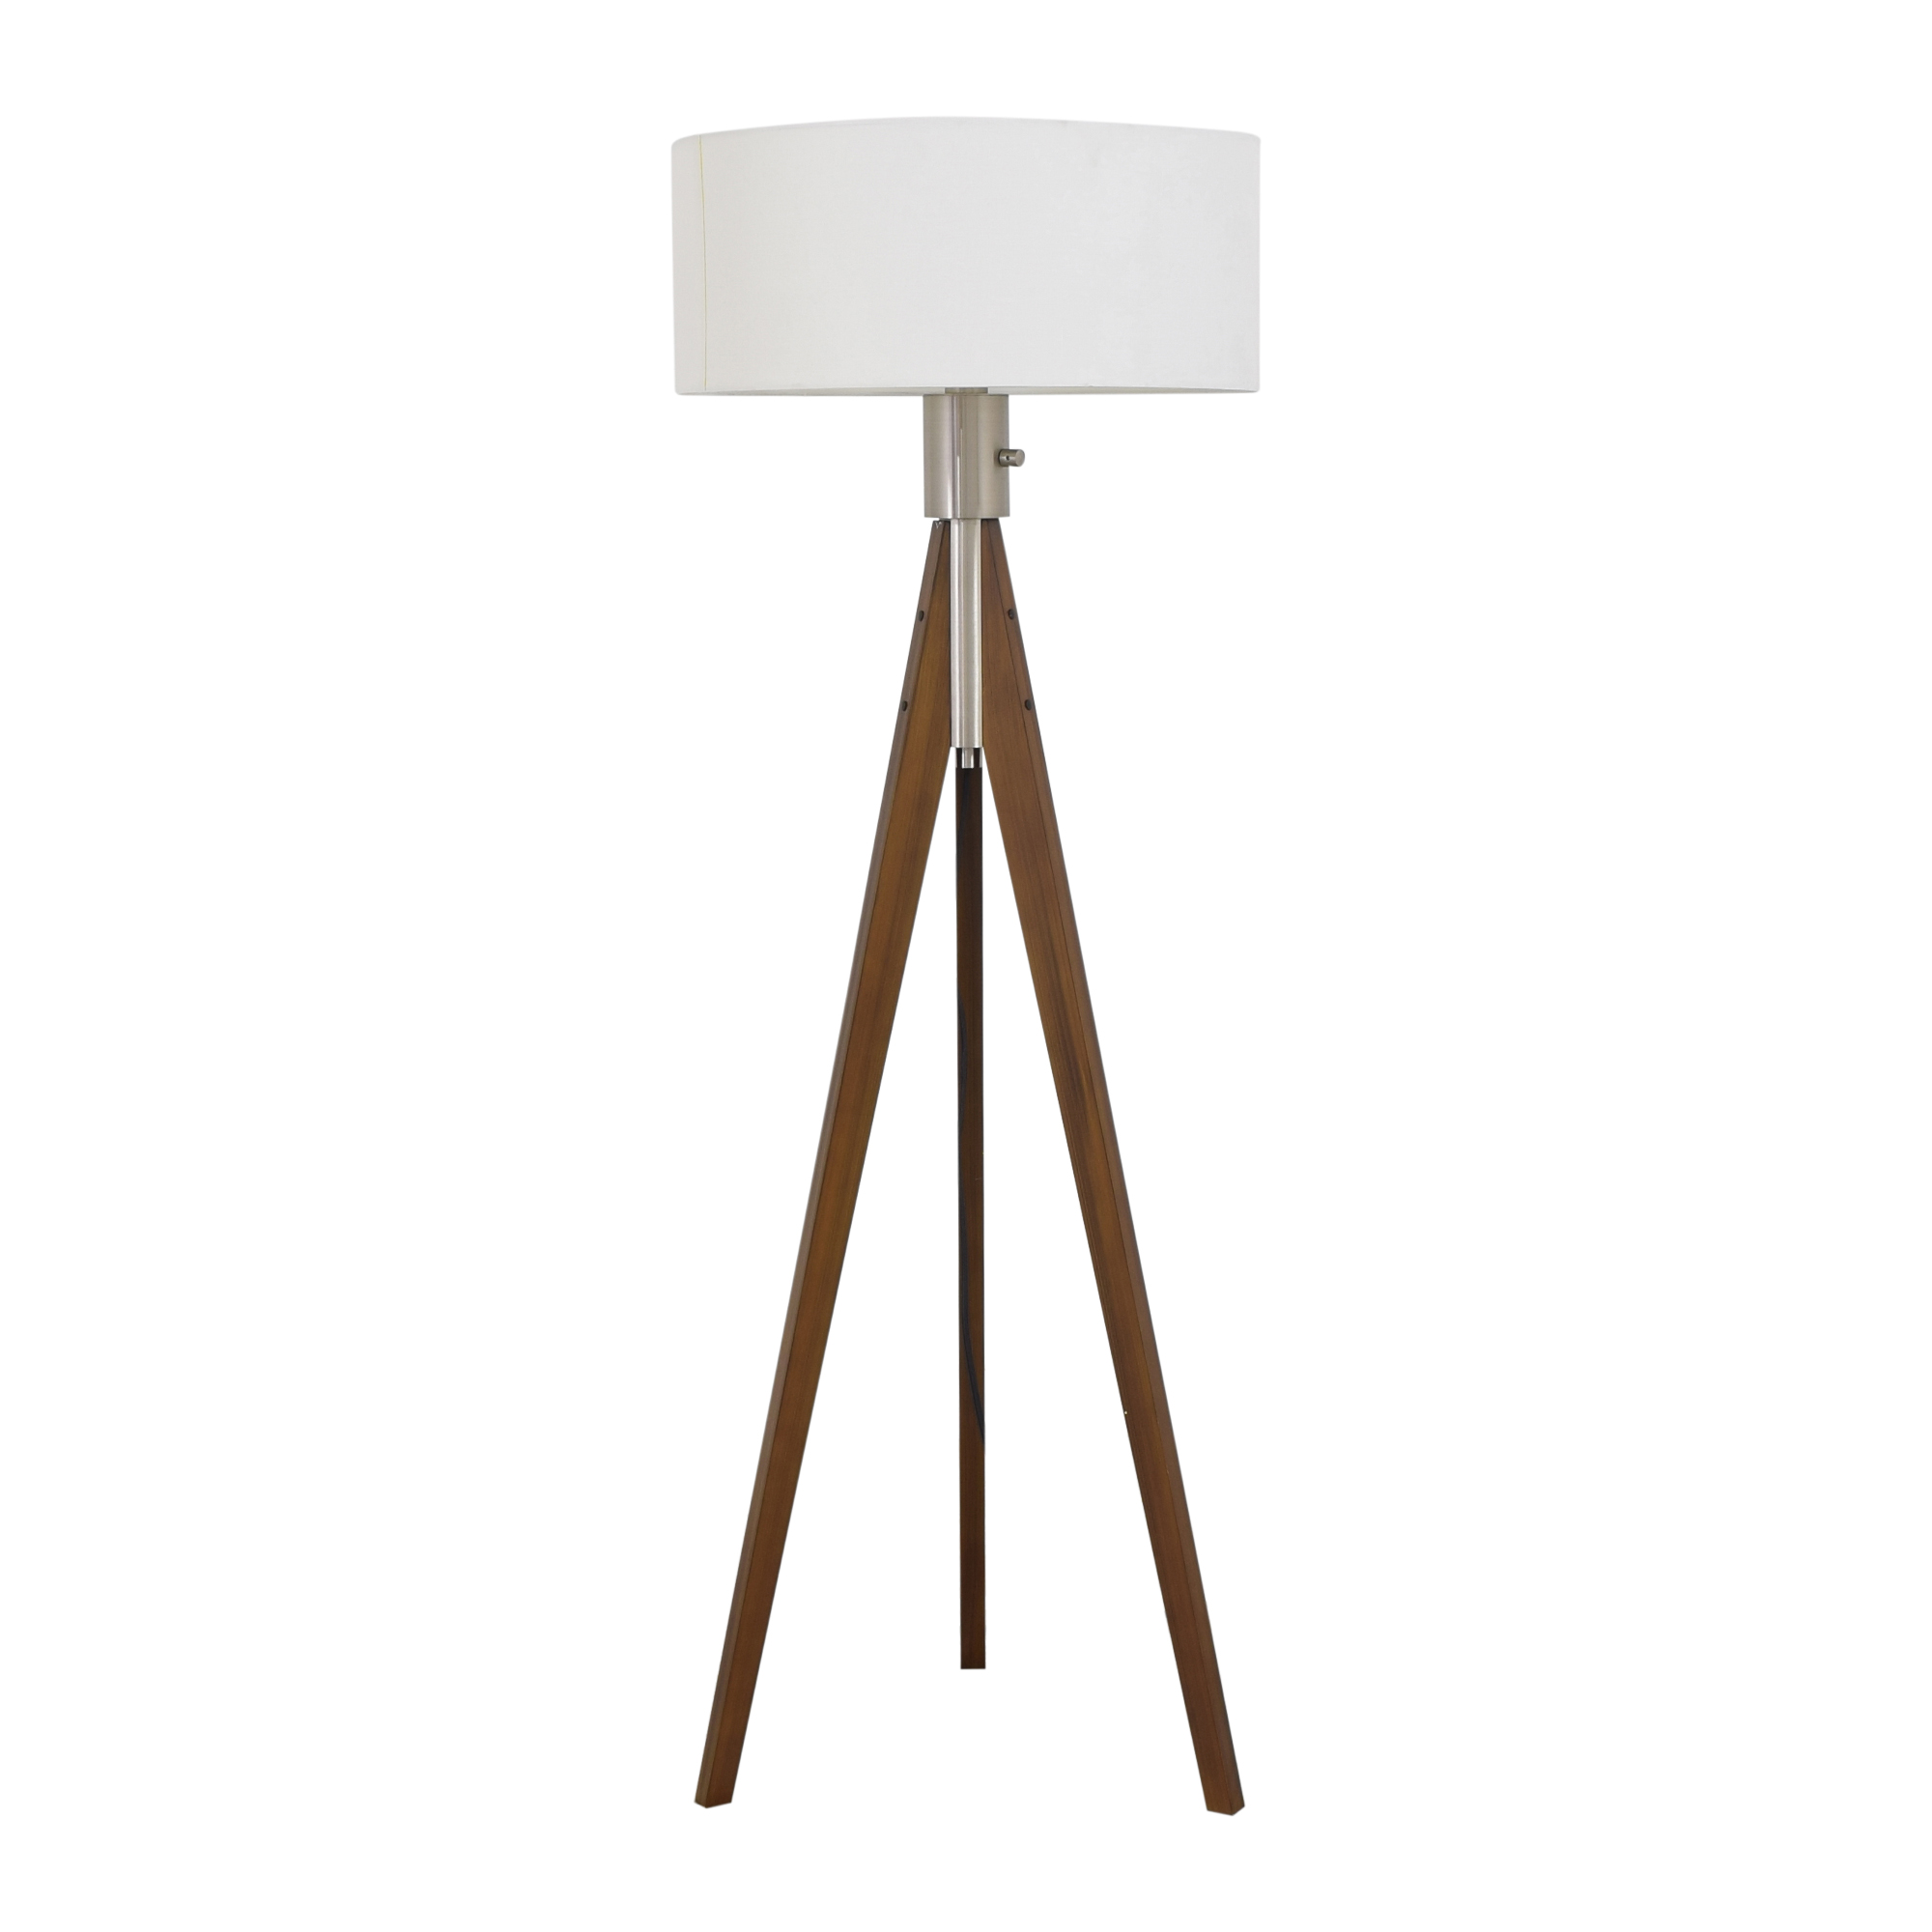 NOVA NOVA Tripod Floor Lamp for sale